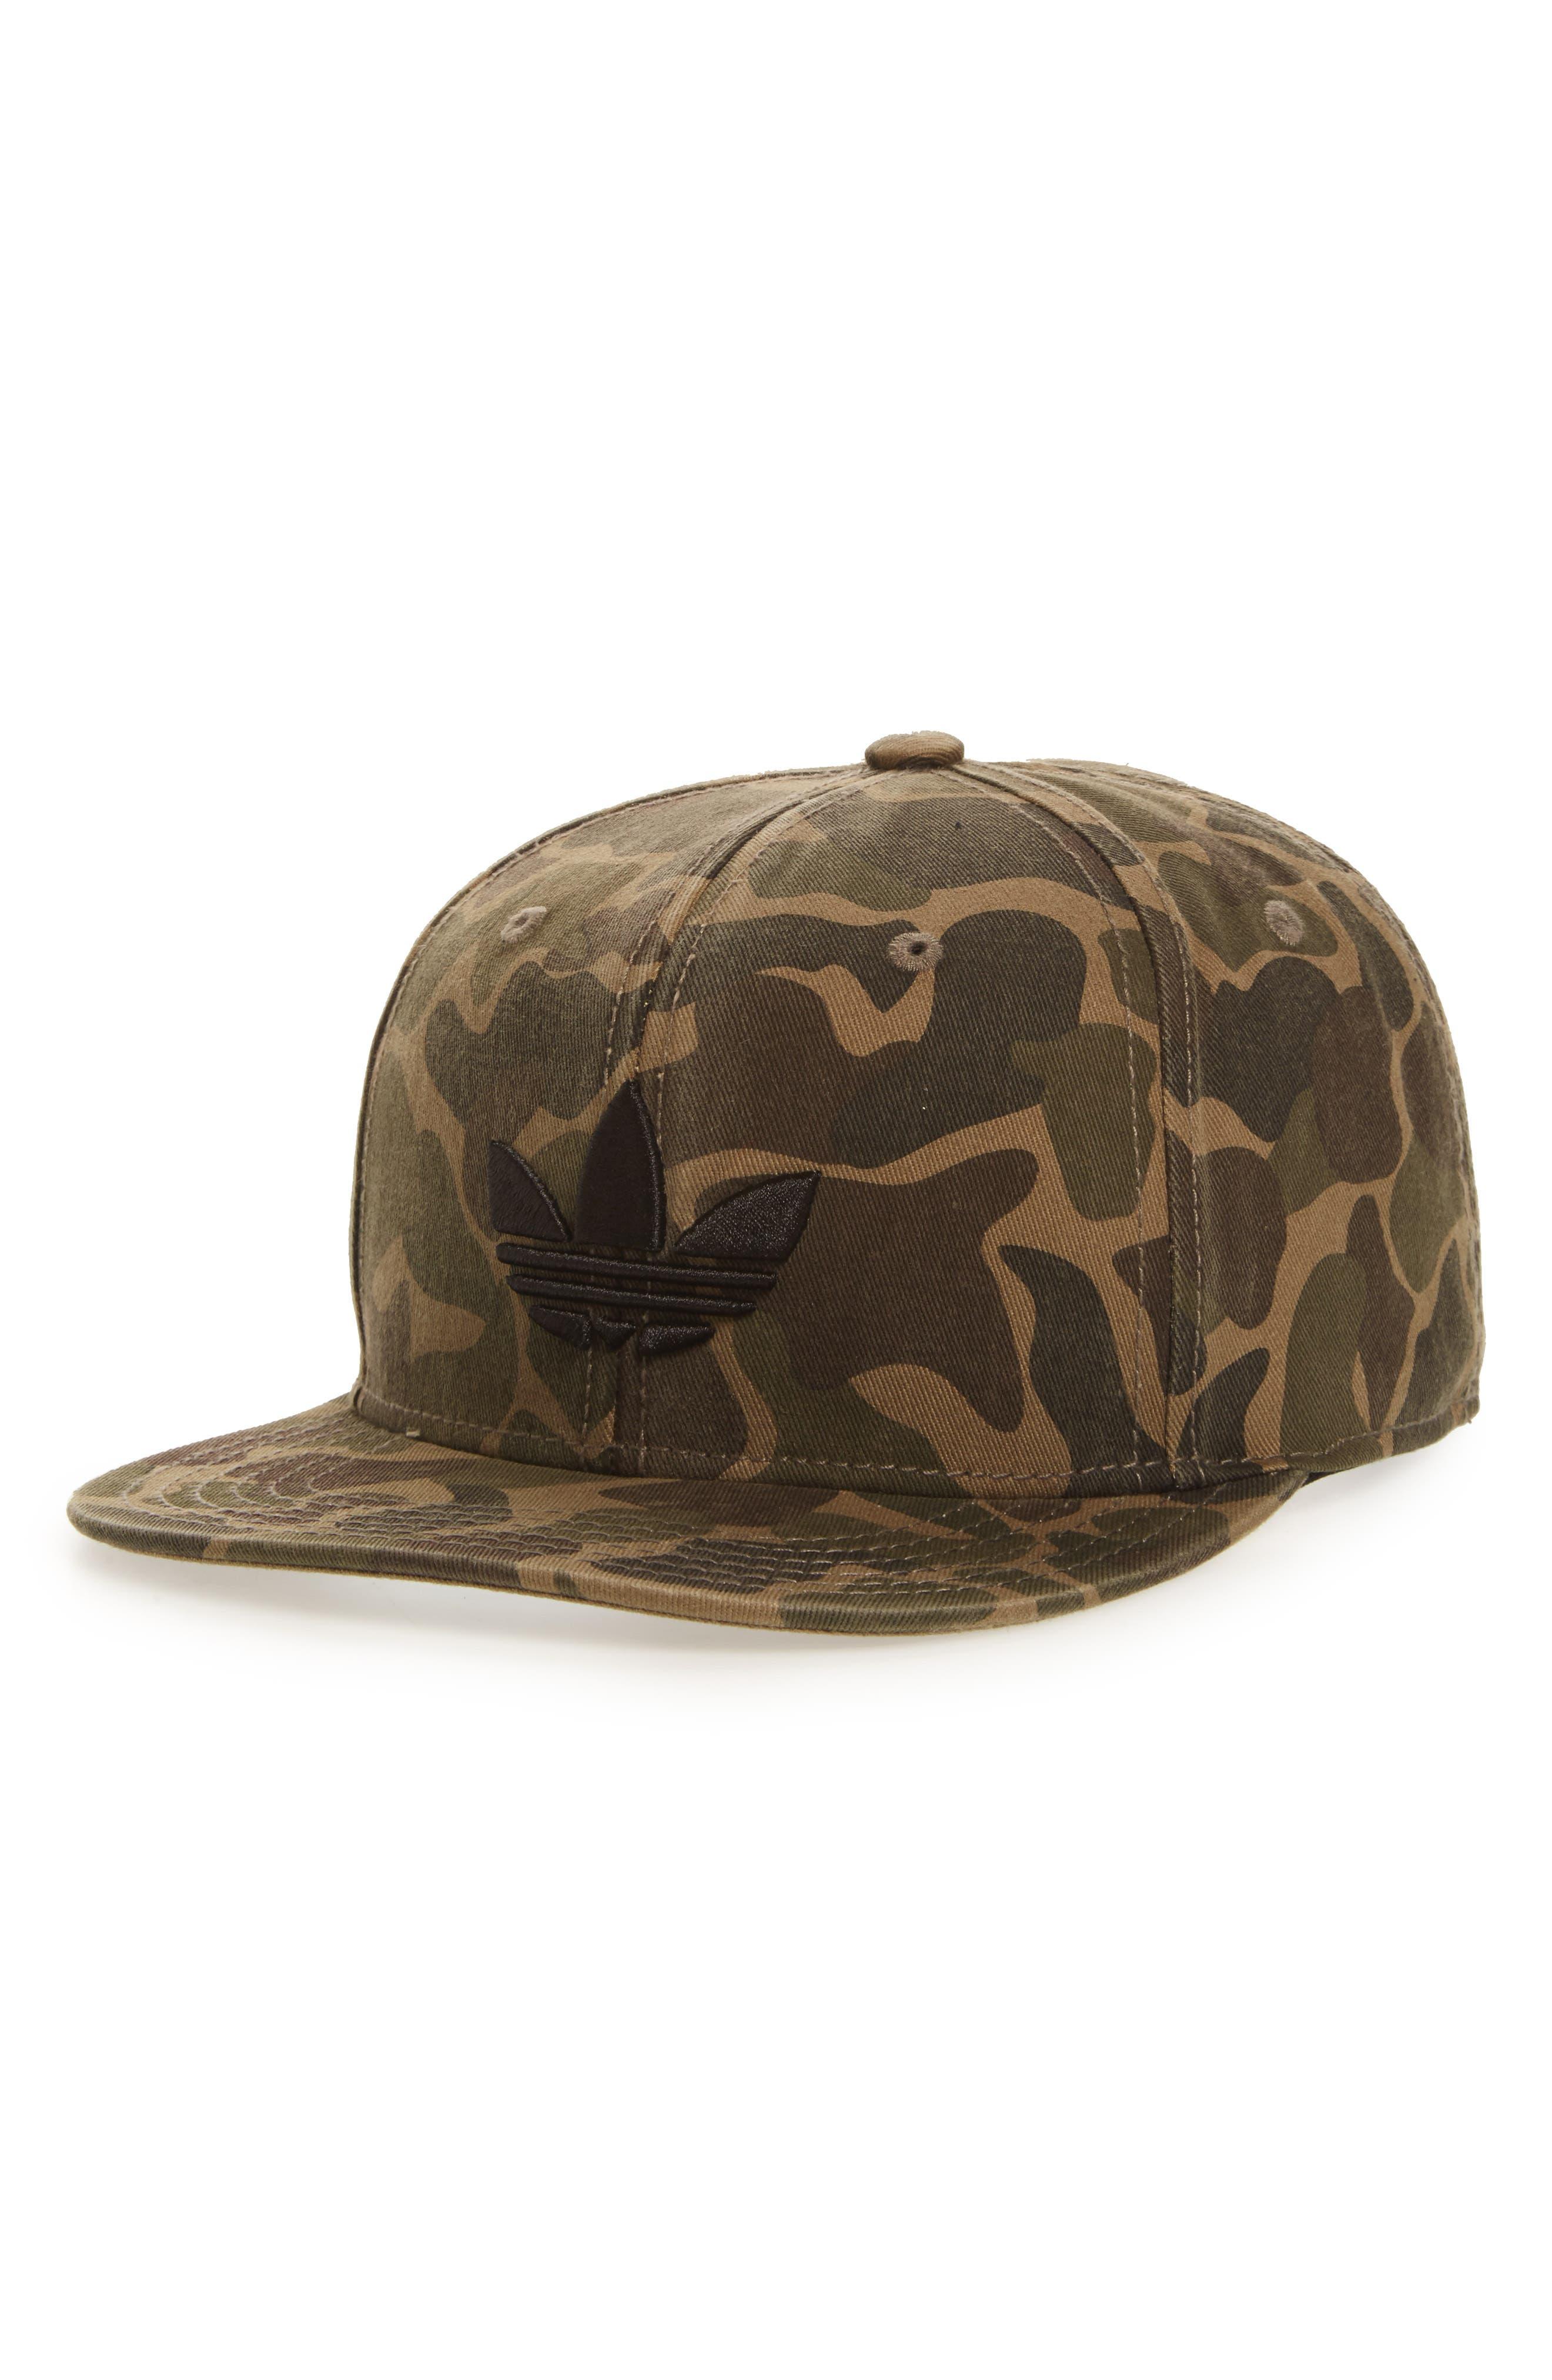 Adidas Originals Ori Trefoil Plus Snapback Baseball Cap - Green In Forest  Camo  Black 720fab98222a